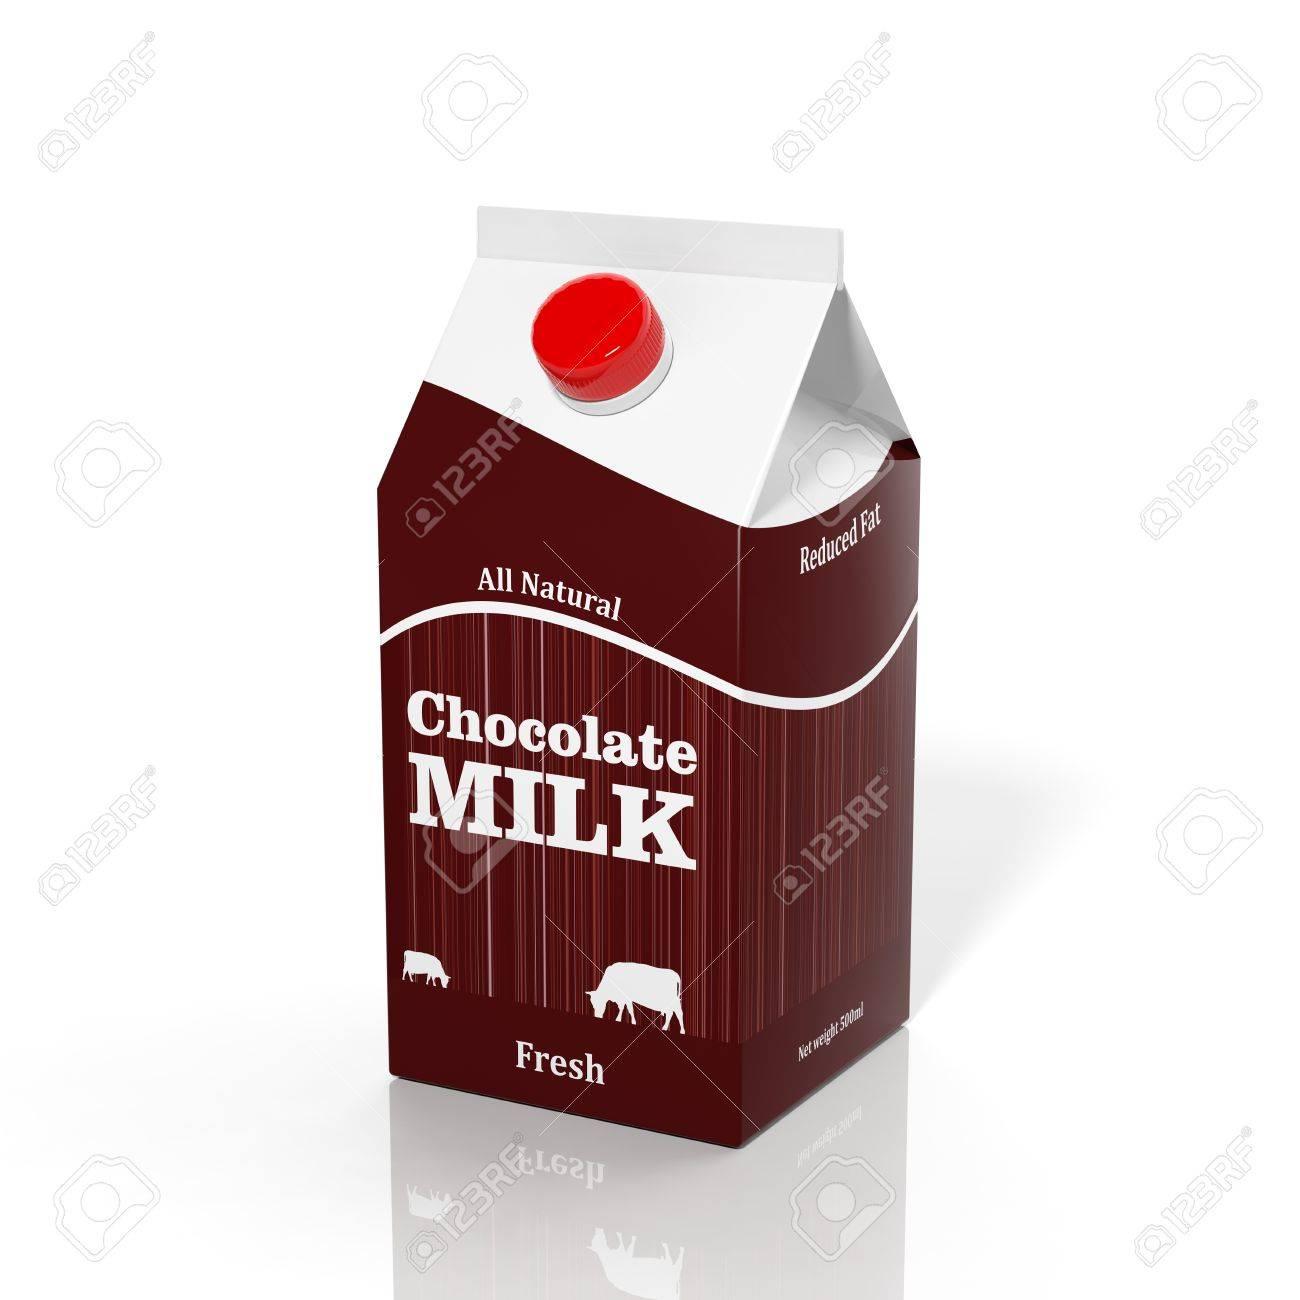 3D choco milk carton box isolated on white Stock Photo - 32955720